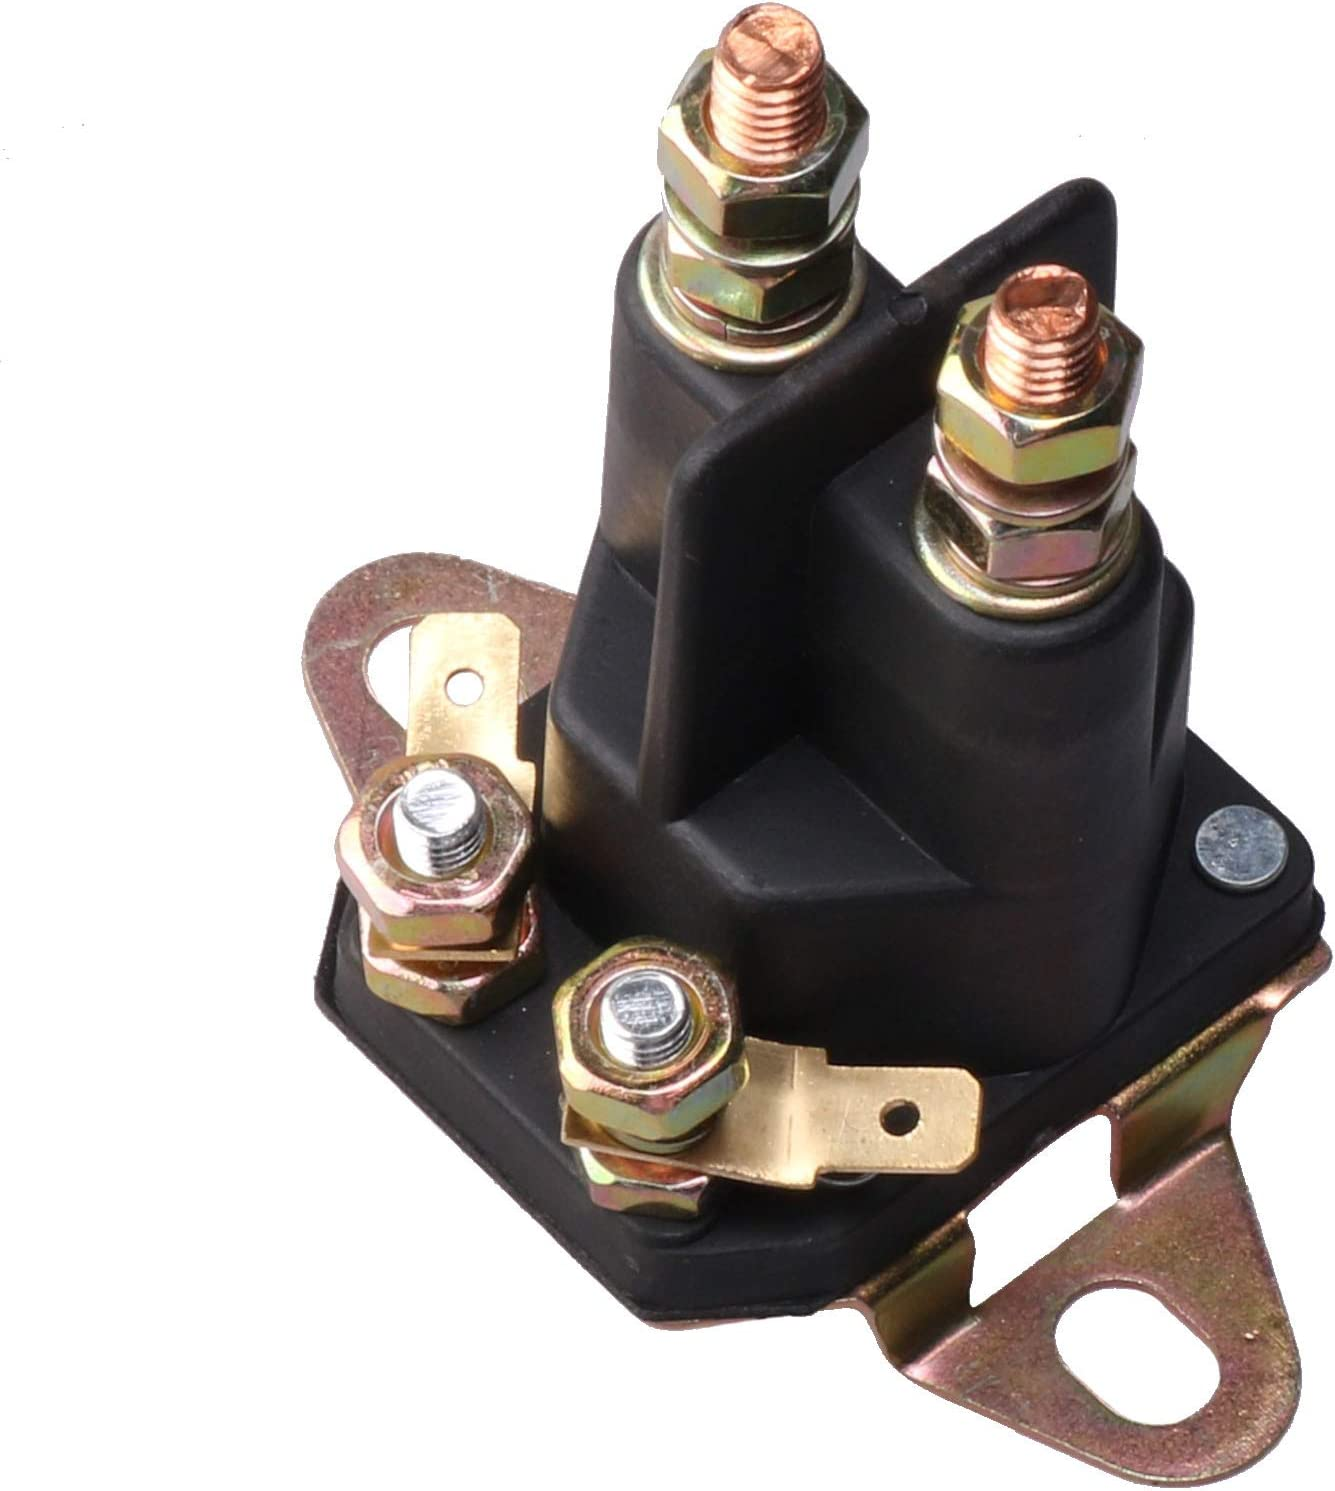 zt truck parts Starter Solenoid 892-1221-210 884-1221-210-02 894-1221-210 Fit for Trombetta Toro 28-4210 47-1910 94285